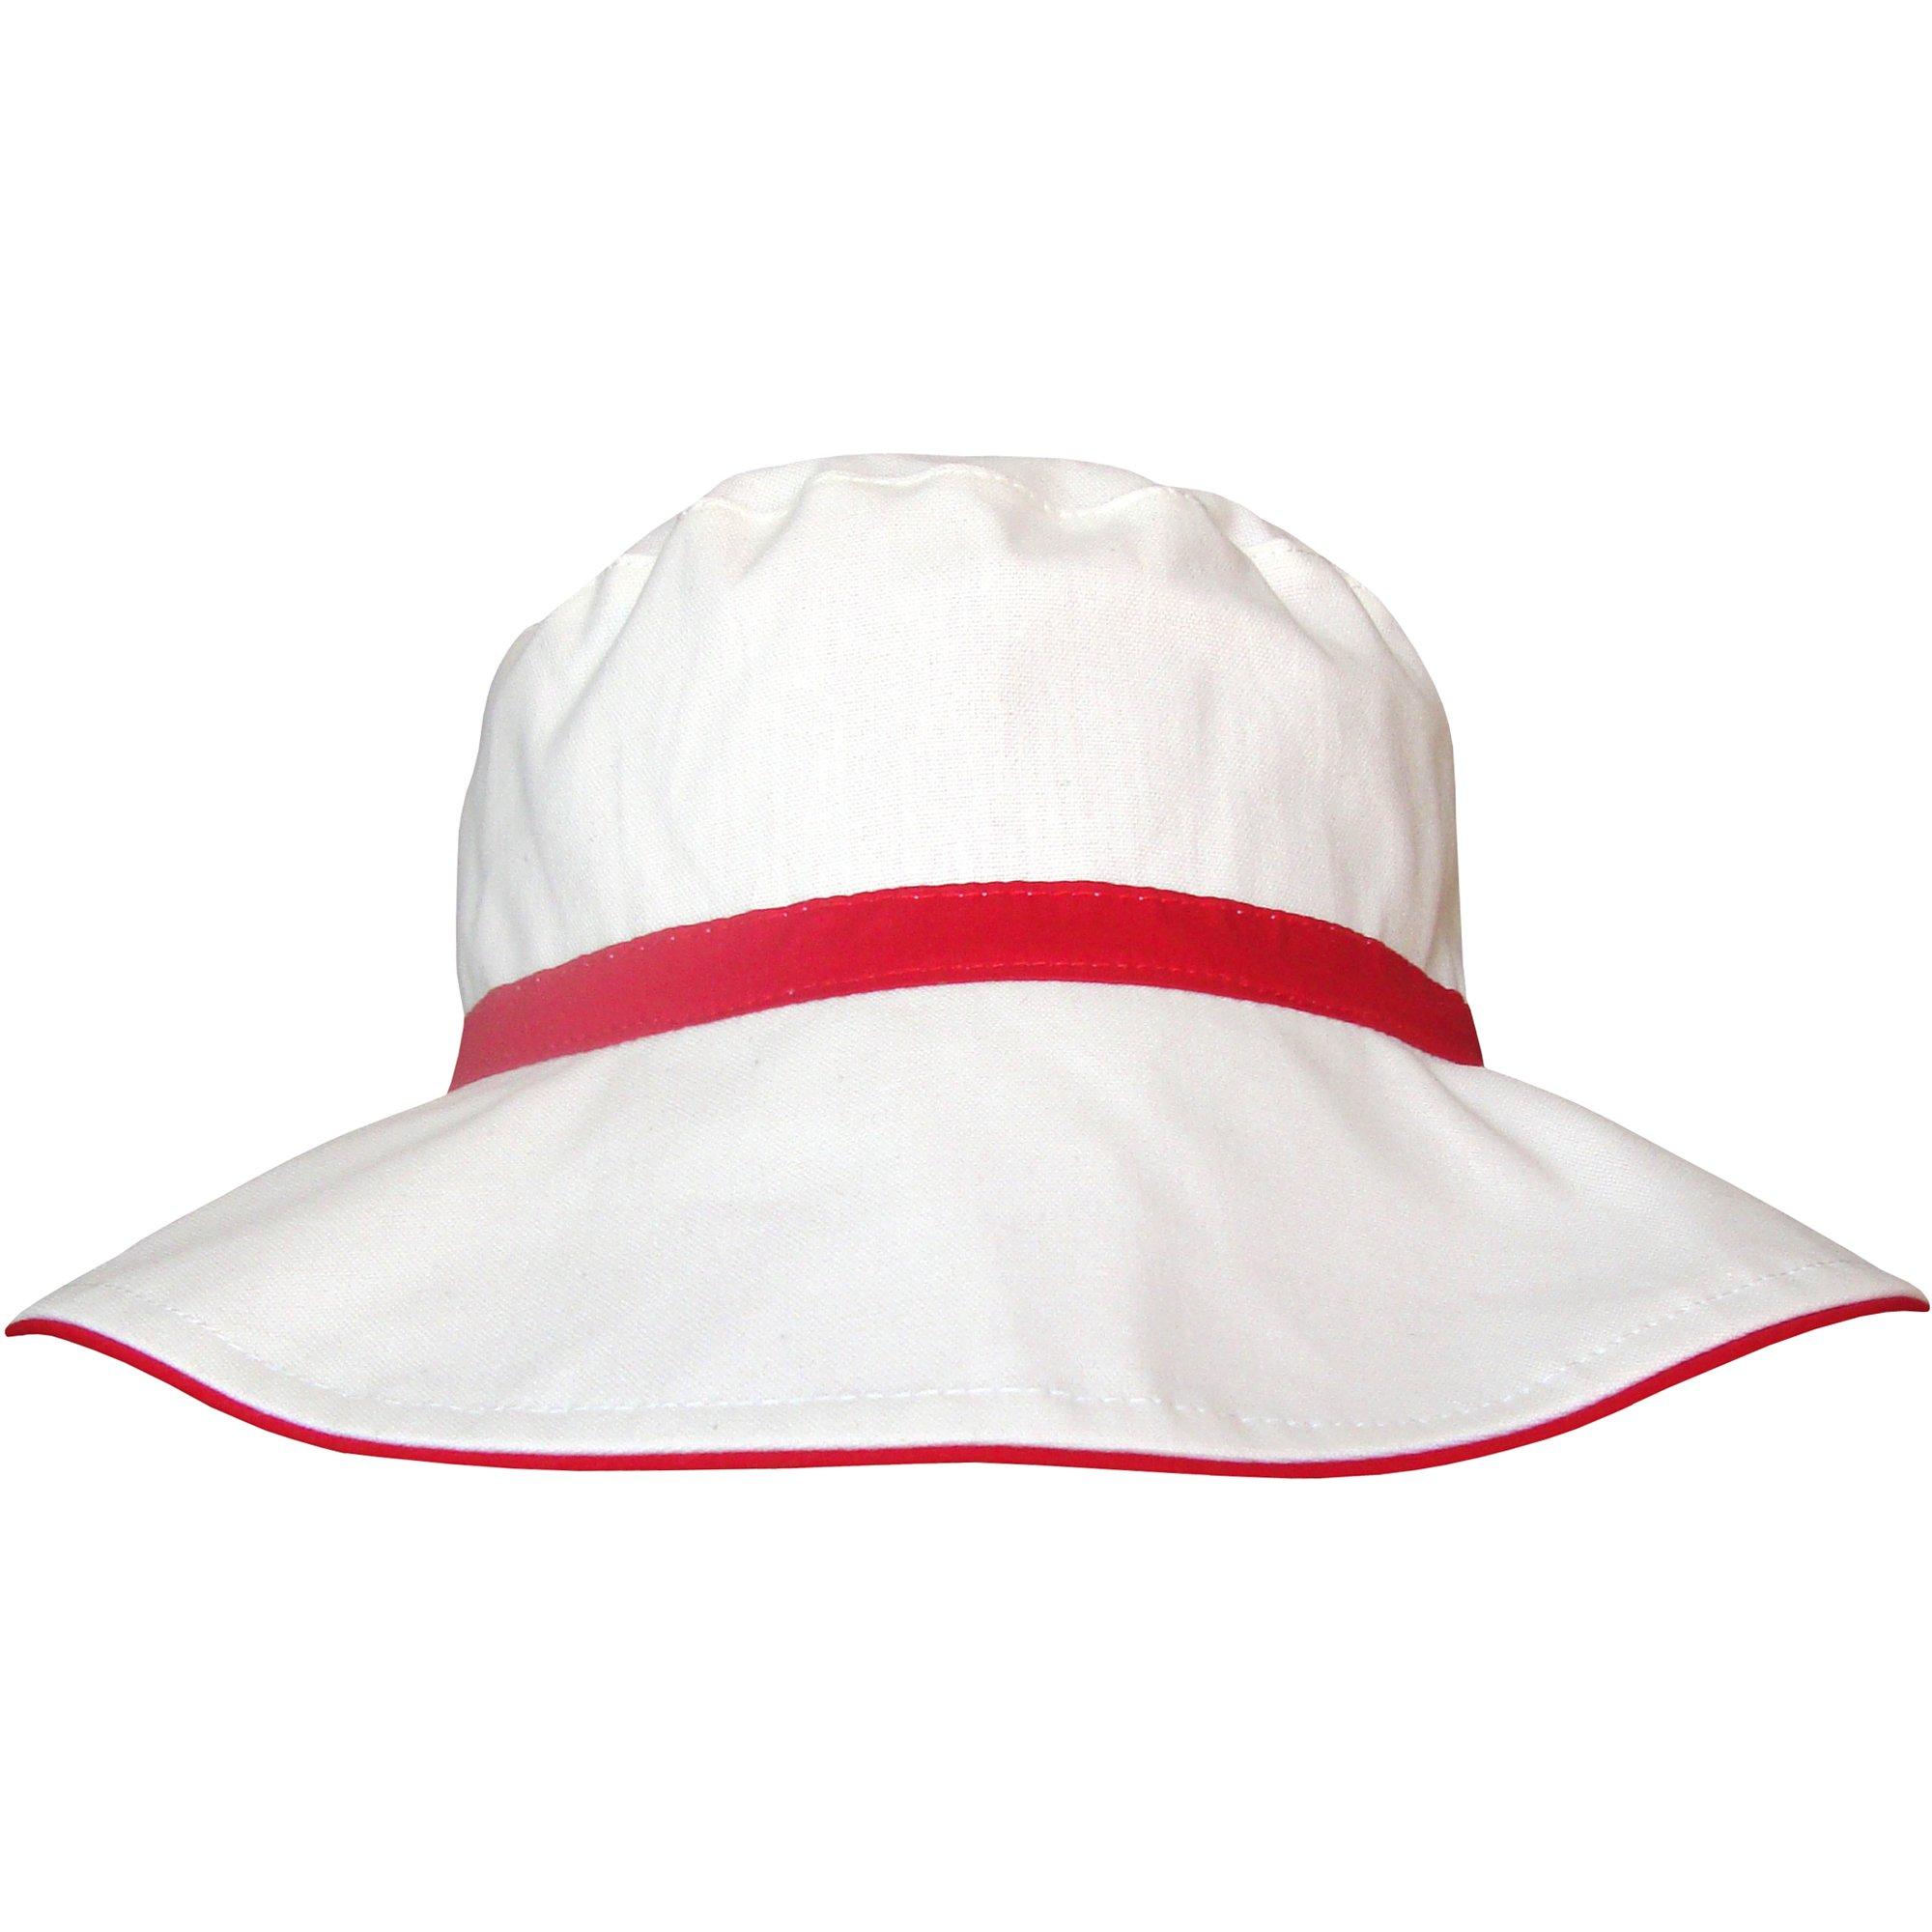 b2994beecfe Best Rated in Women s Sun Hats   Helpful Customer Reviews - Amazon.co.uk